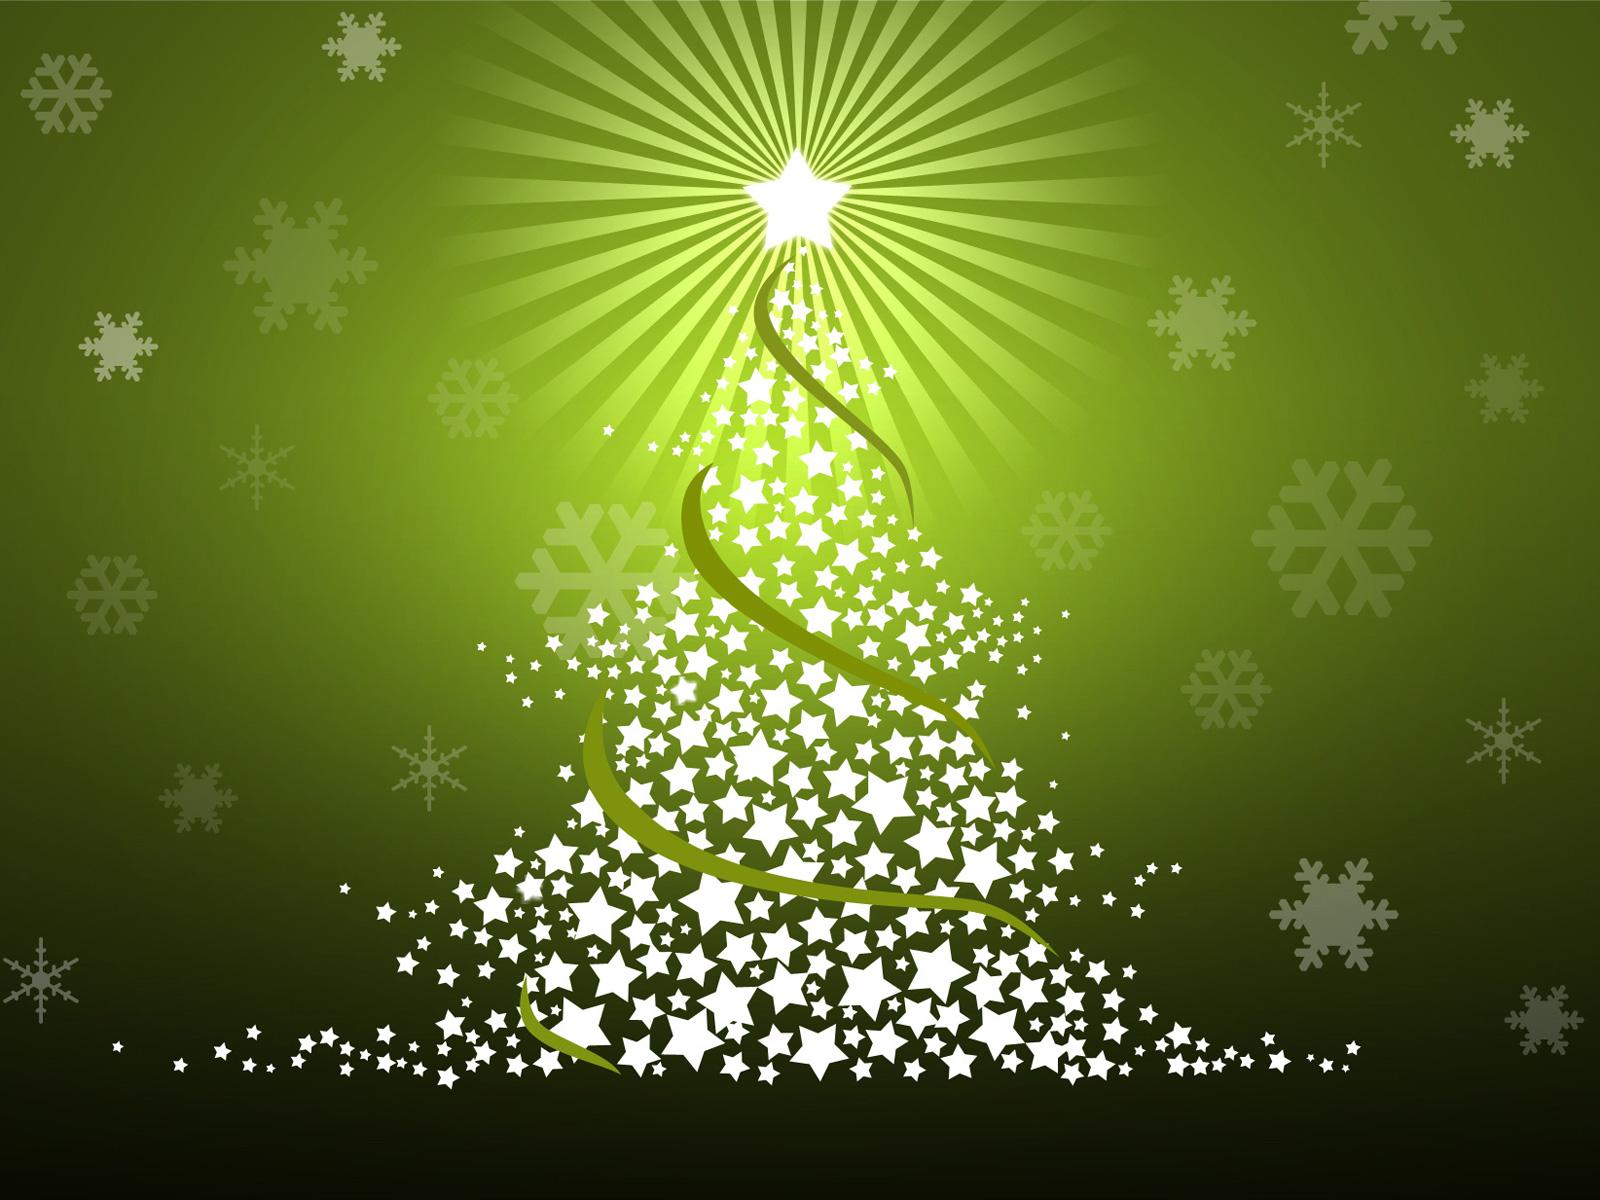 domingo diciembre